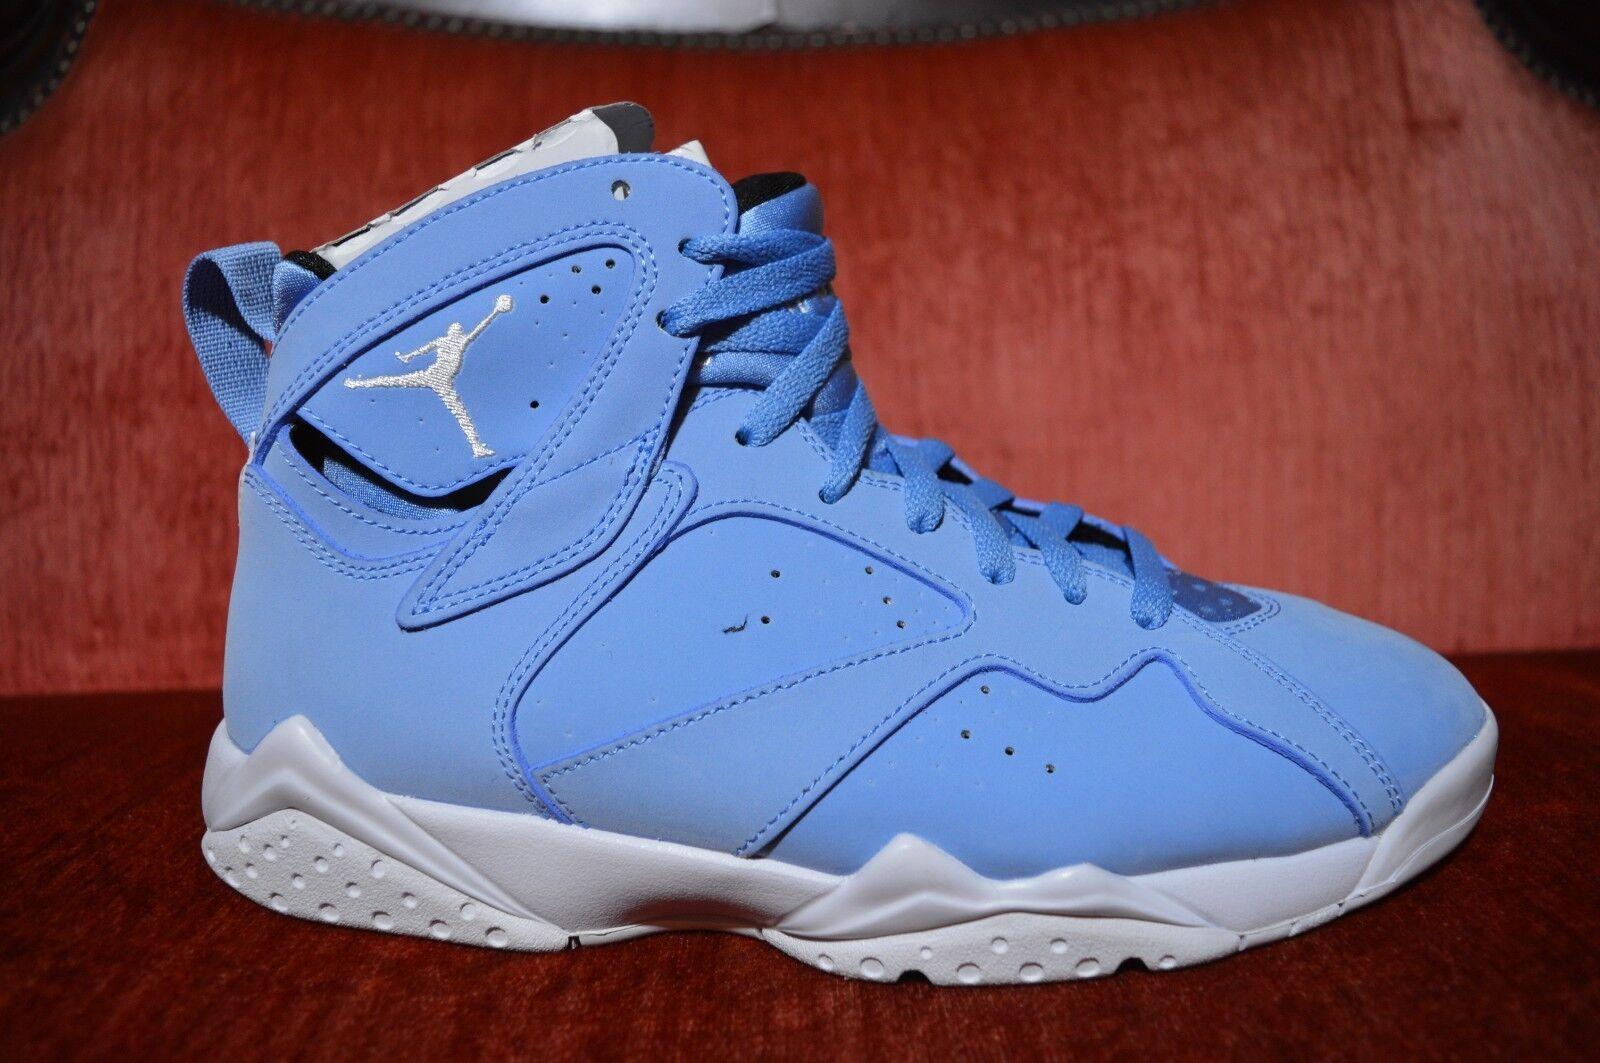 Nike Air Jordan 7 Retro VII Pantone University Blue 304775-400 Men size 8 Seasonal clearance sale